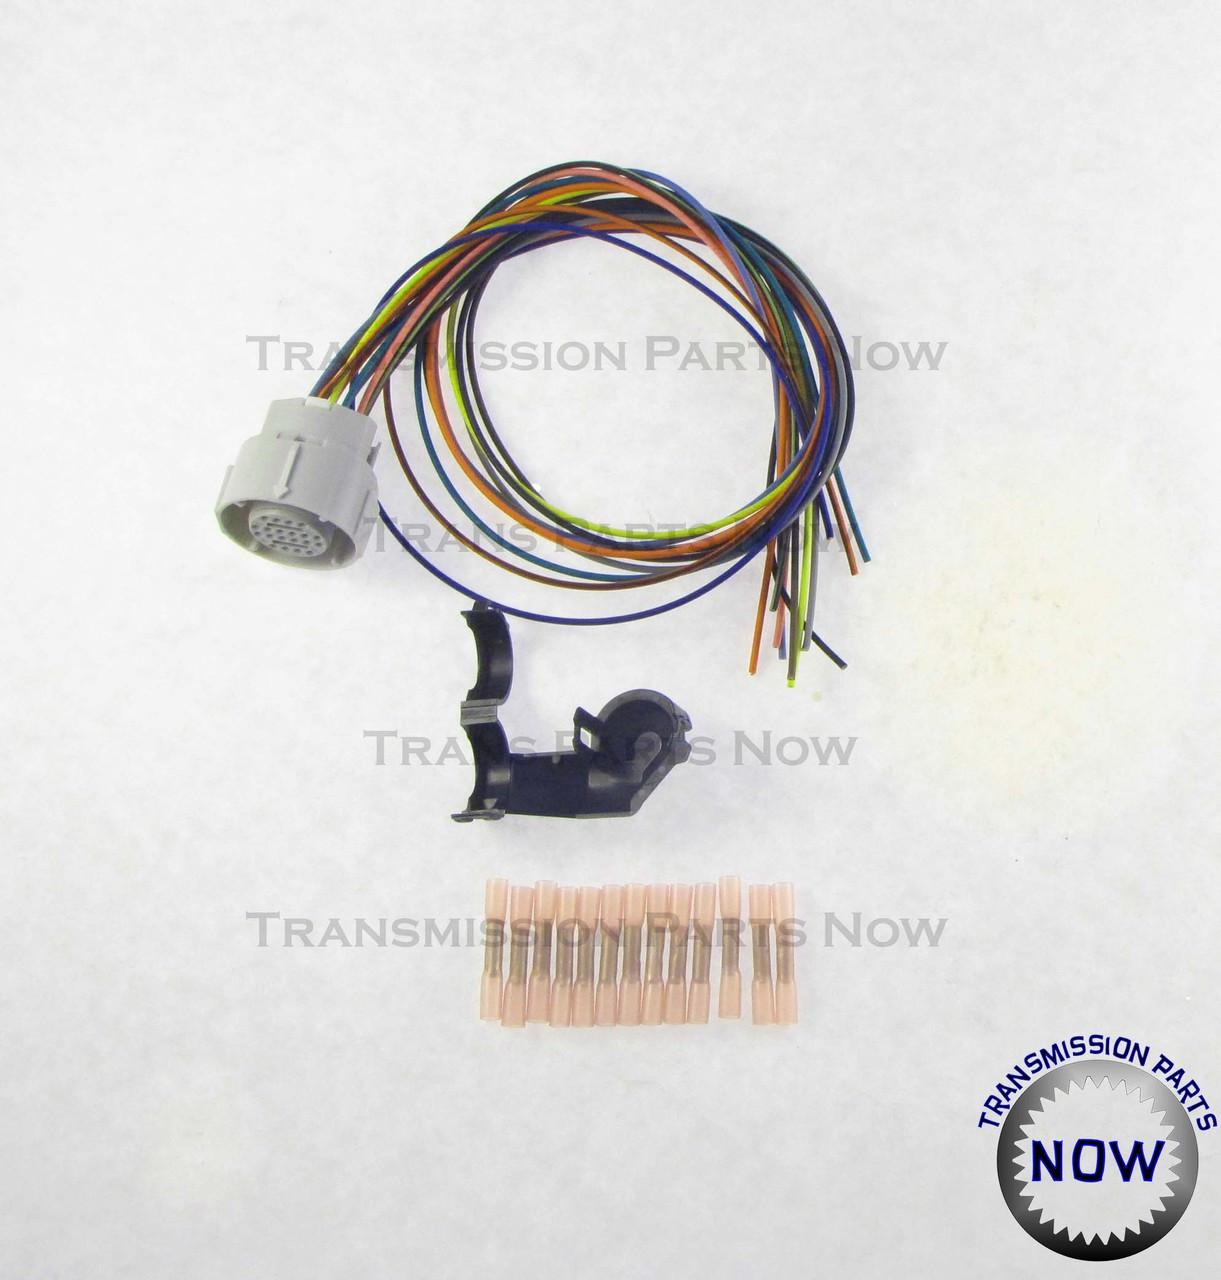 4l80e external wiring harness update kit, 34445ek 4R100 Transmission Diagram